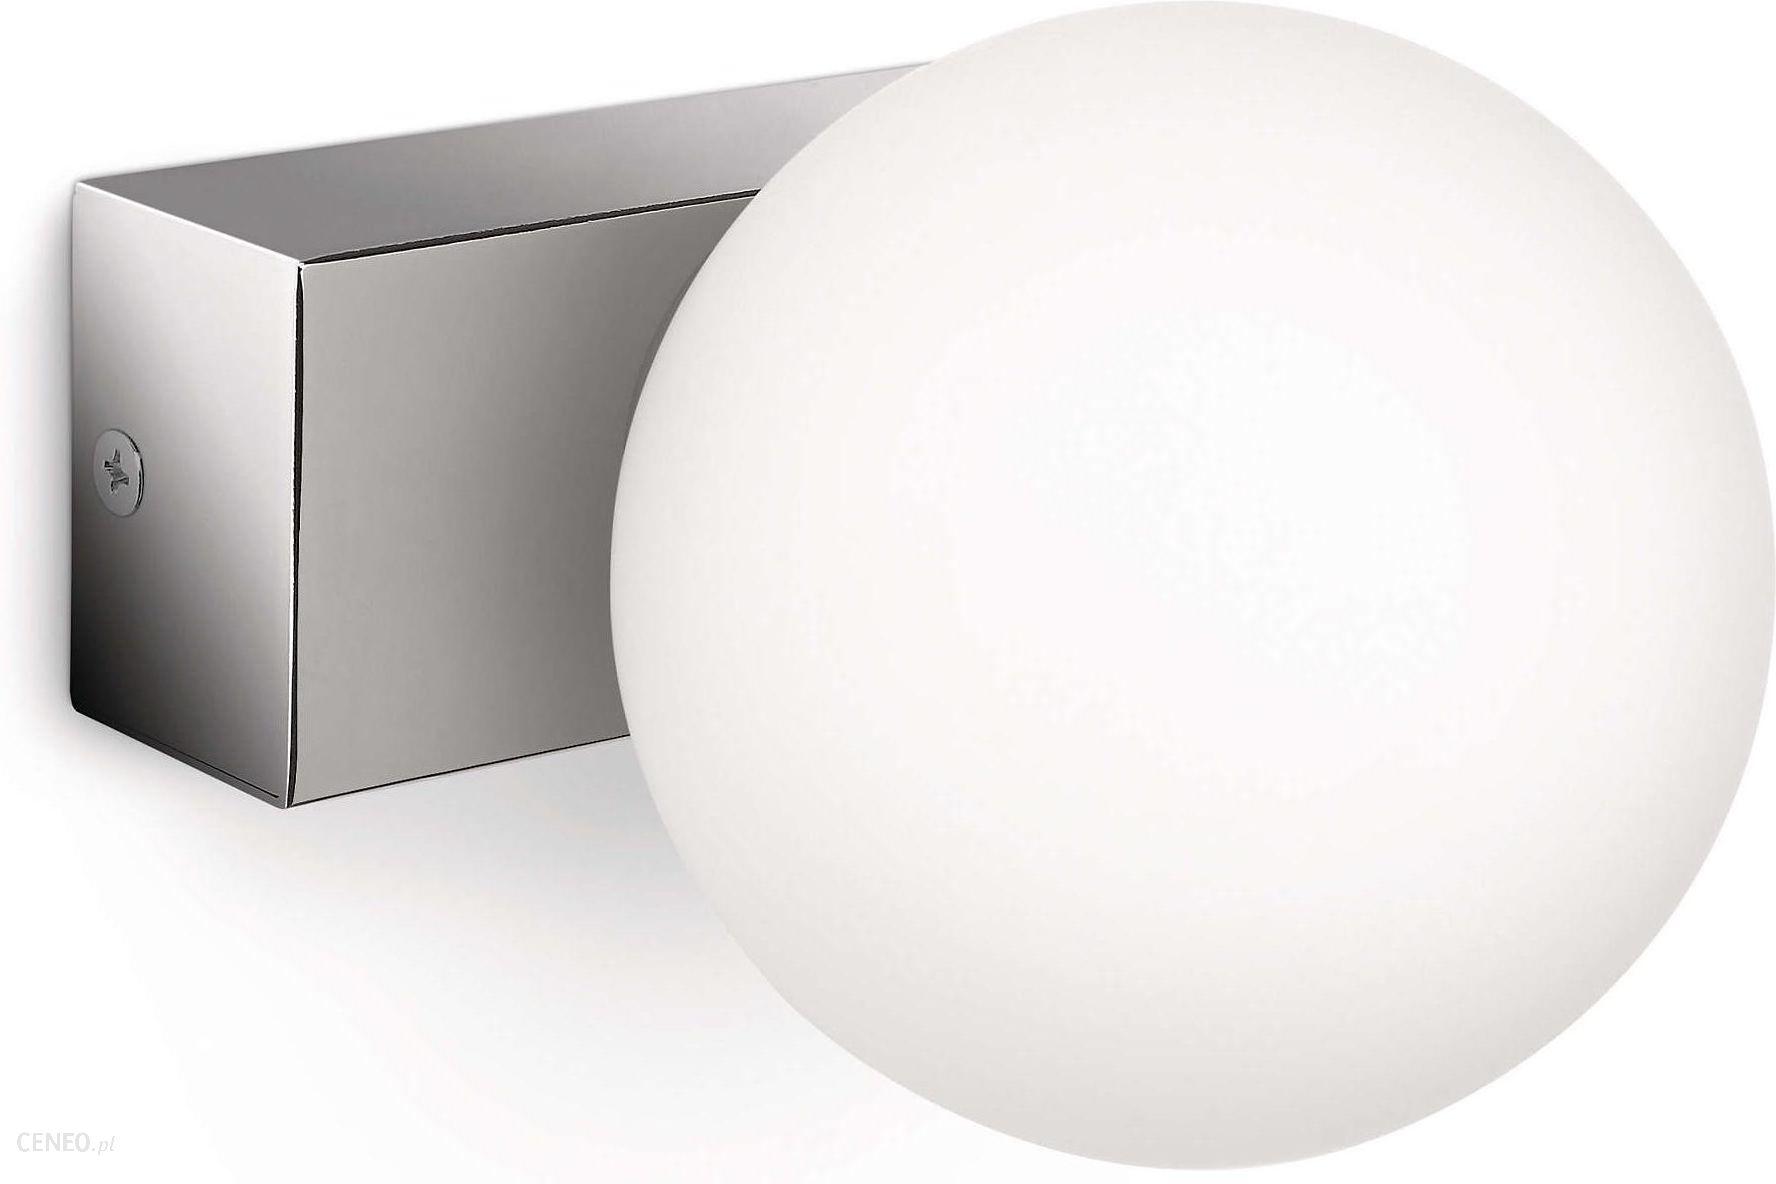 artyku 34054 11 16 kolor szk o metal wymiary wysoko 10cm szeroko 12 5cm g boko. Black Bedroom Furniture Sets. Home Design Ideas